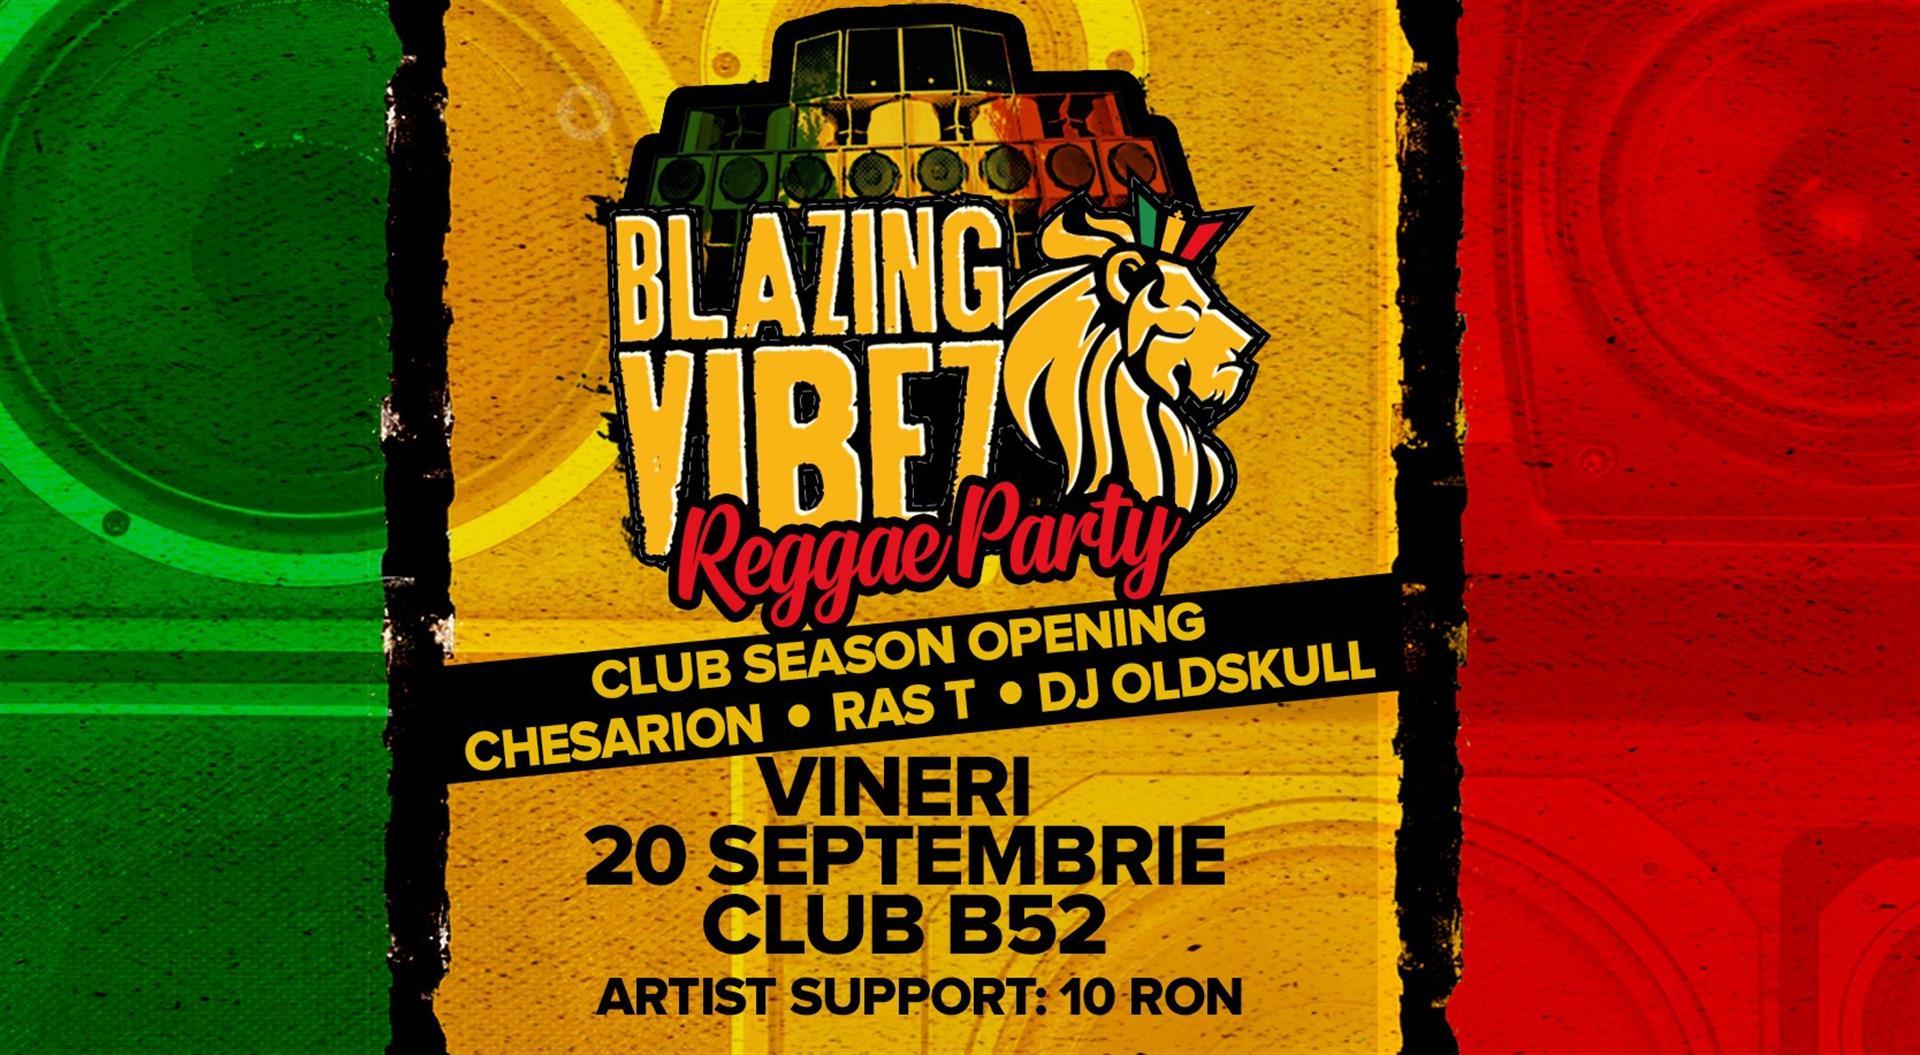 Blazing Vibez Reggae Party - 20 Septembrie